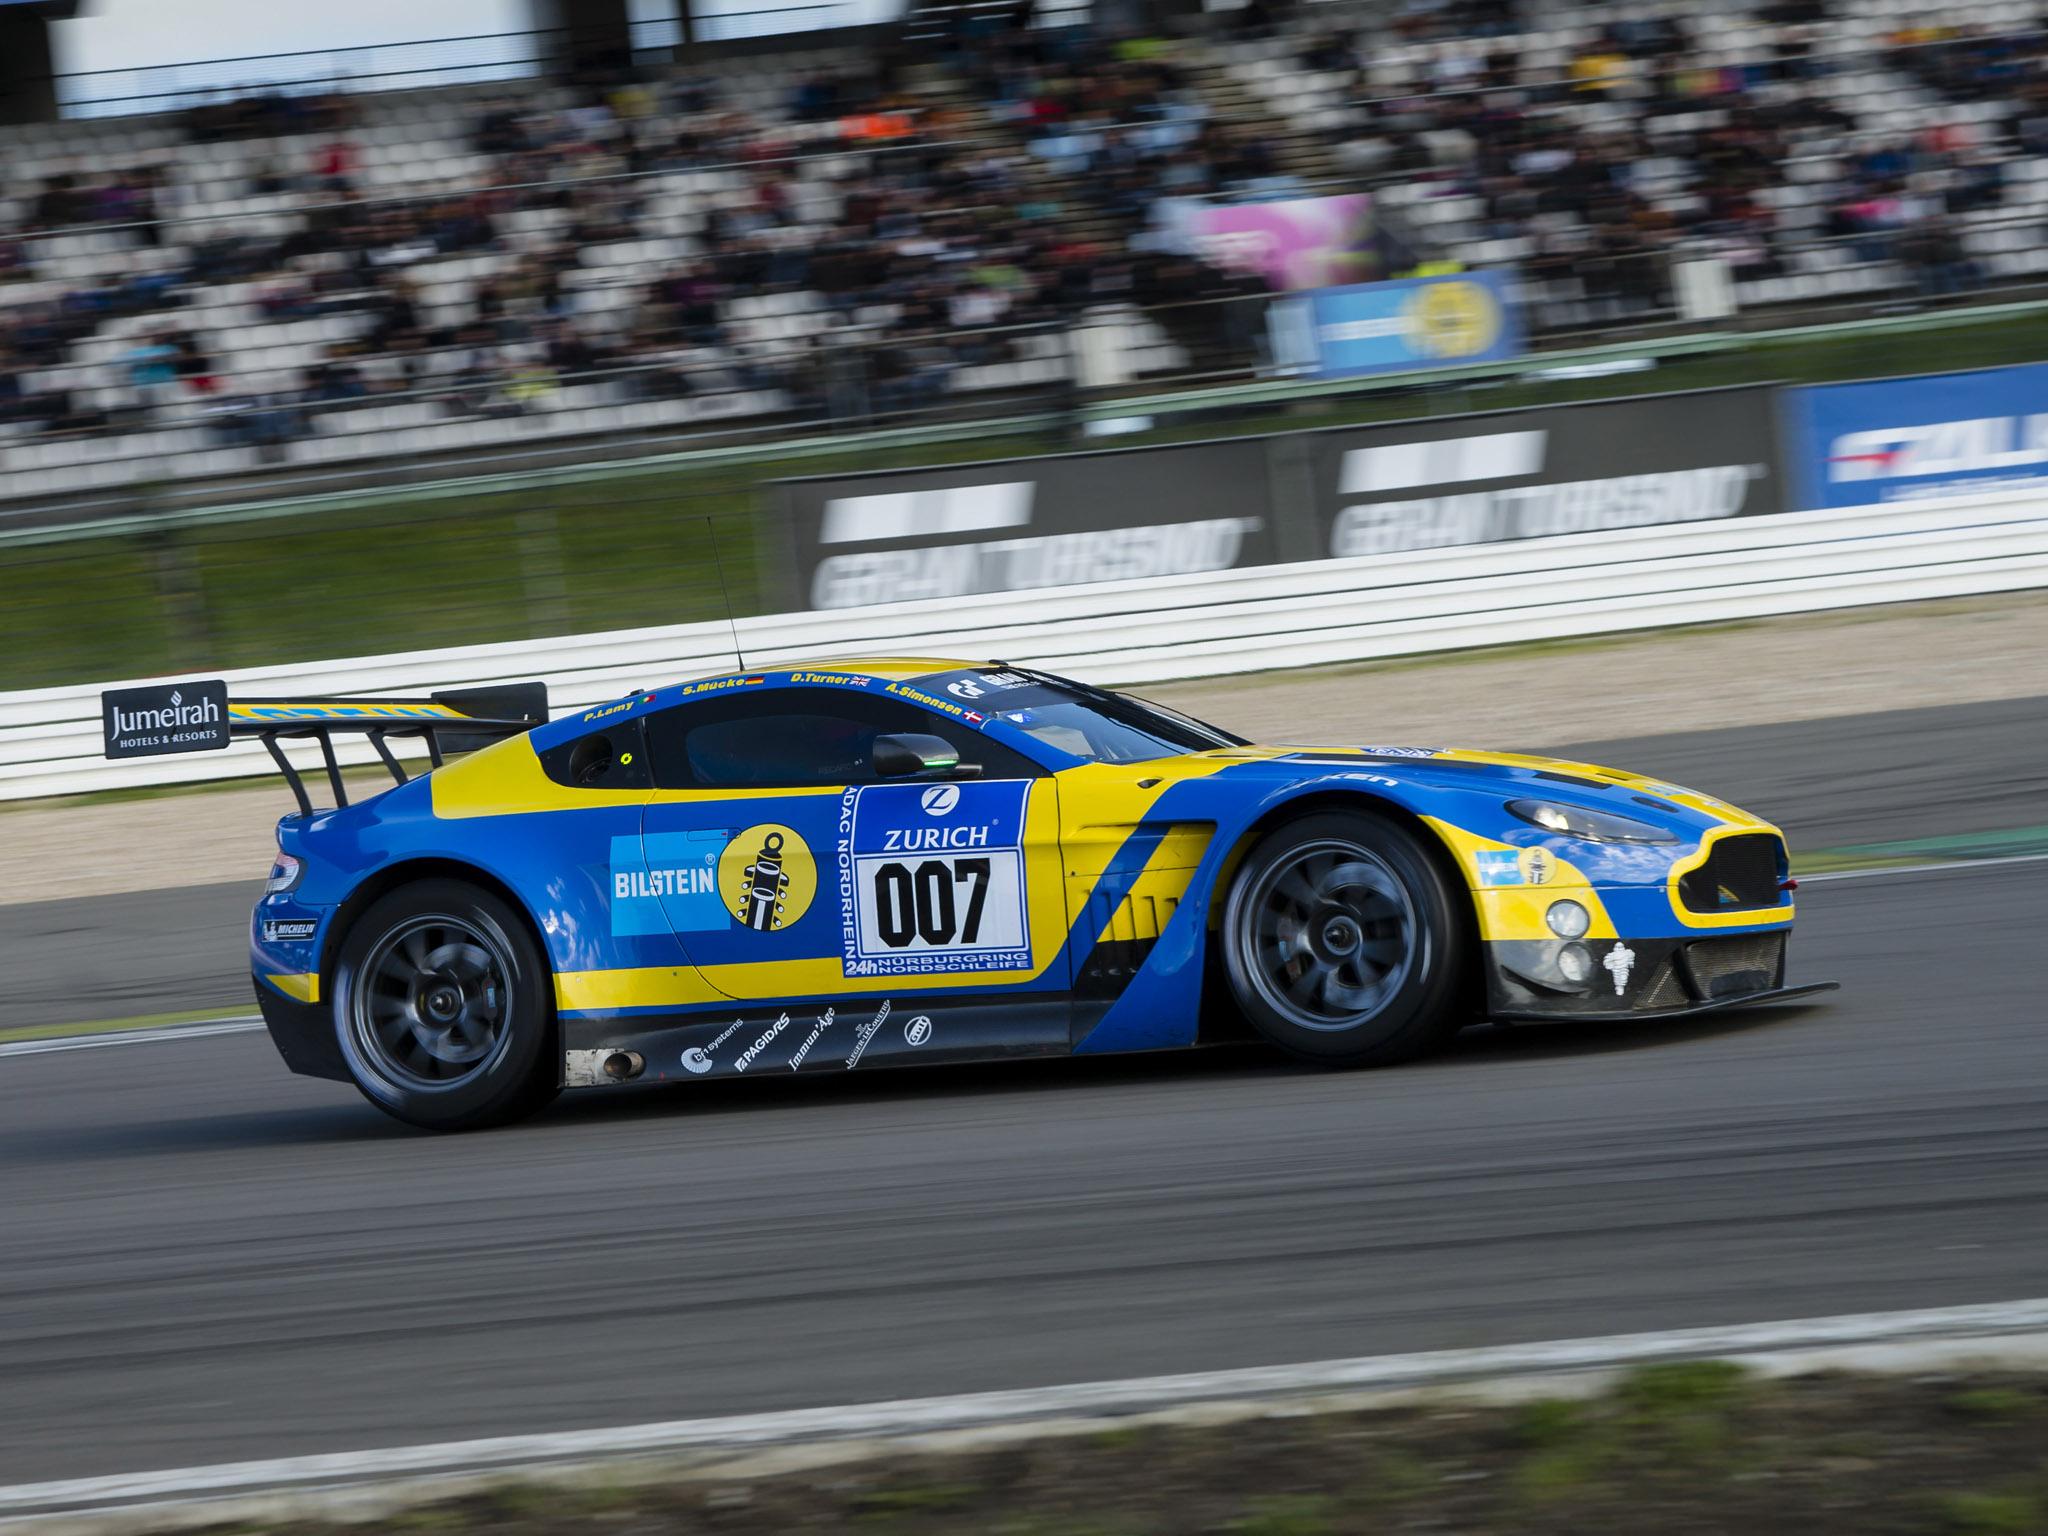 Aston Martin Vantage GT3 Race Car '13 (Team Bilstein Aston Martin Racing).jpg